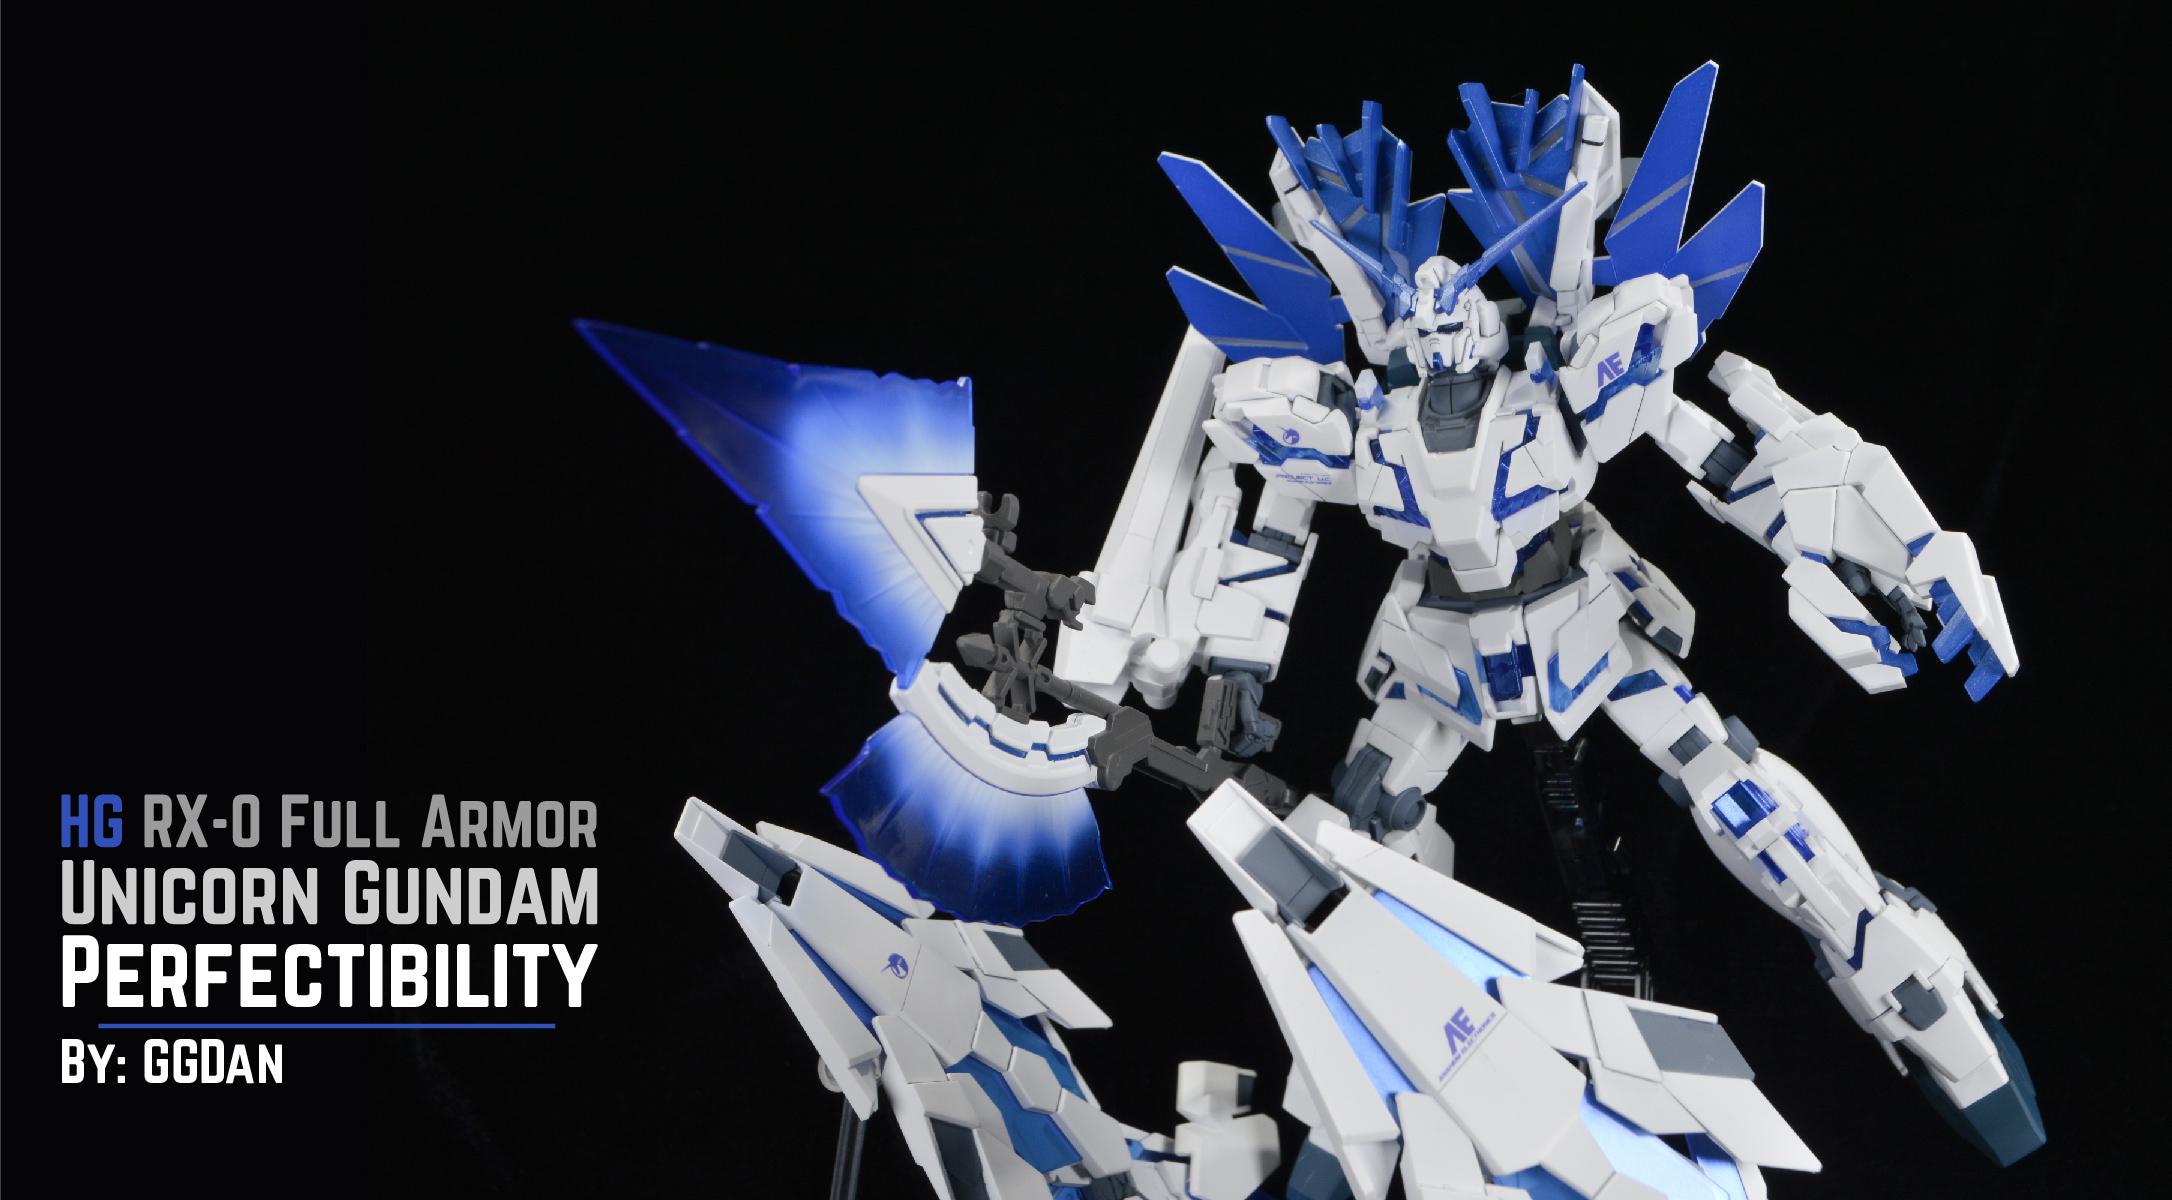 Hg Rx 0 Full Armor Unicorn Gundam Perfectibility